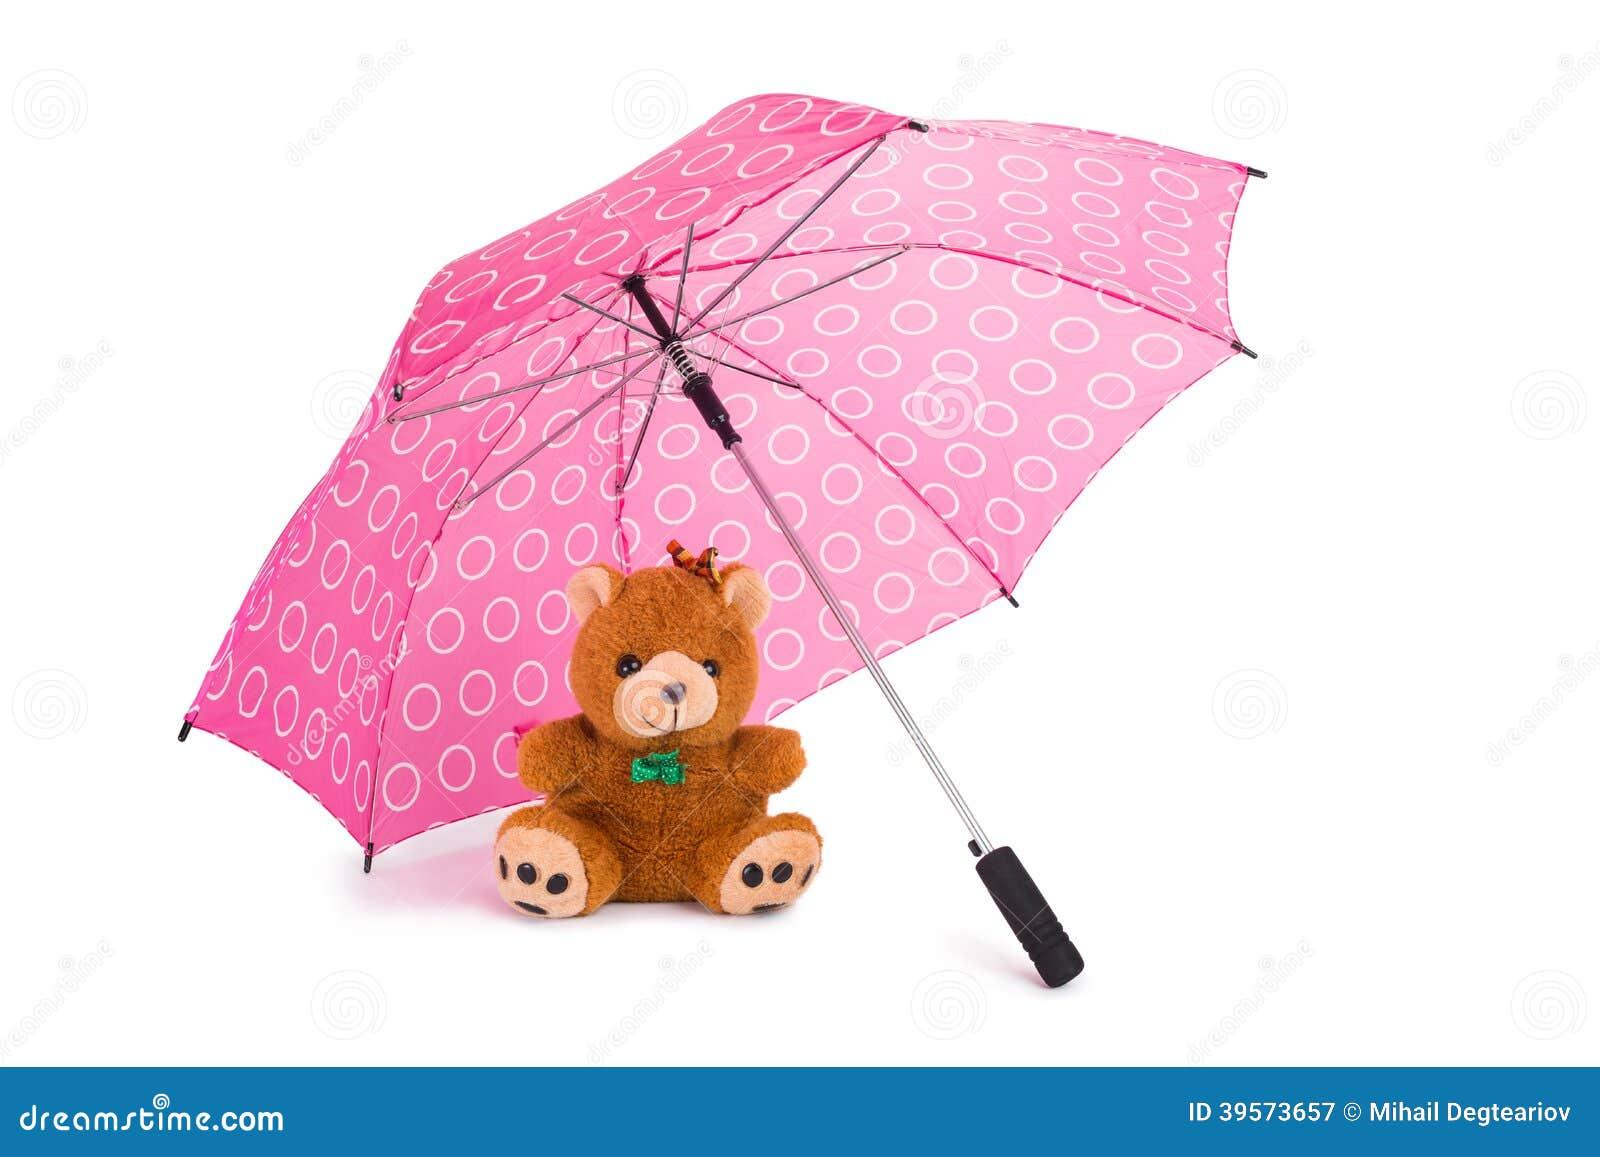 Teddy Beear Under Umbrella